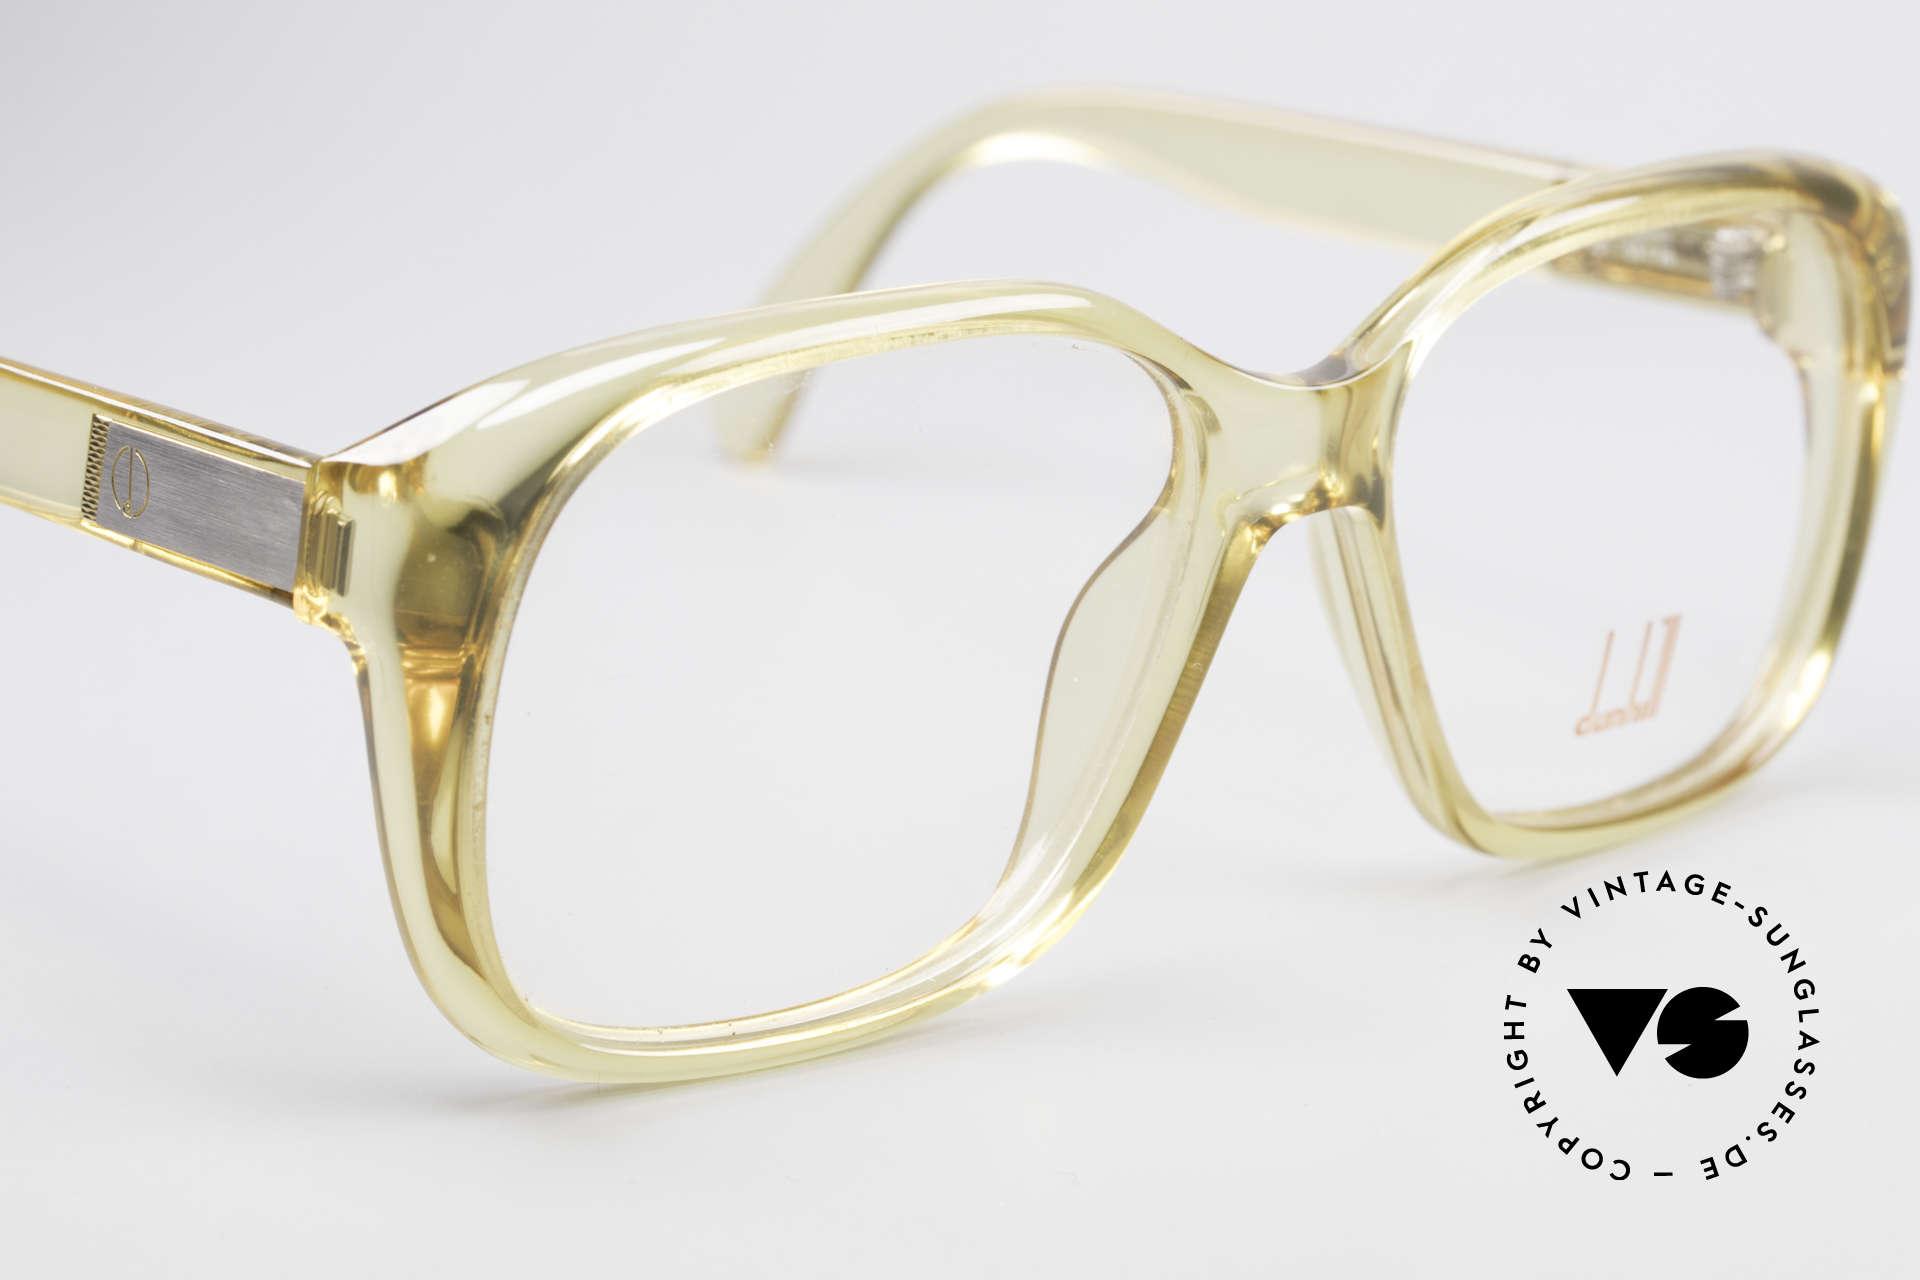 Dunhill 6013 80's Old School Goliath Frame, unworn (like all our VINTAGE Dunhill eyeglass-frames), Made for Men